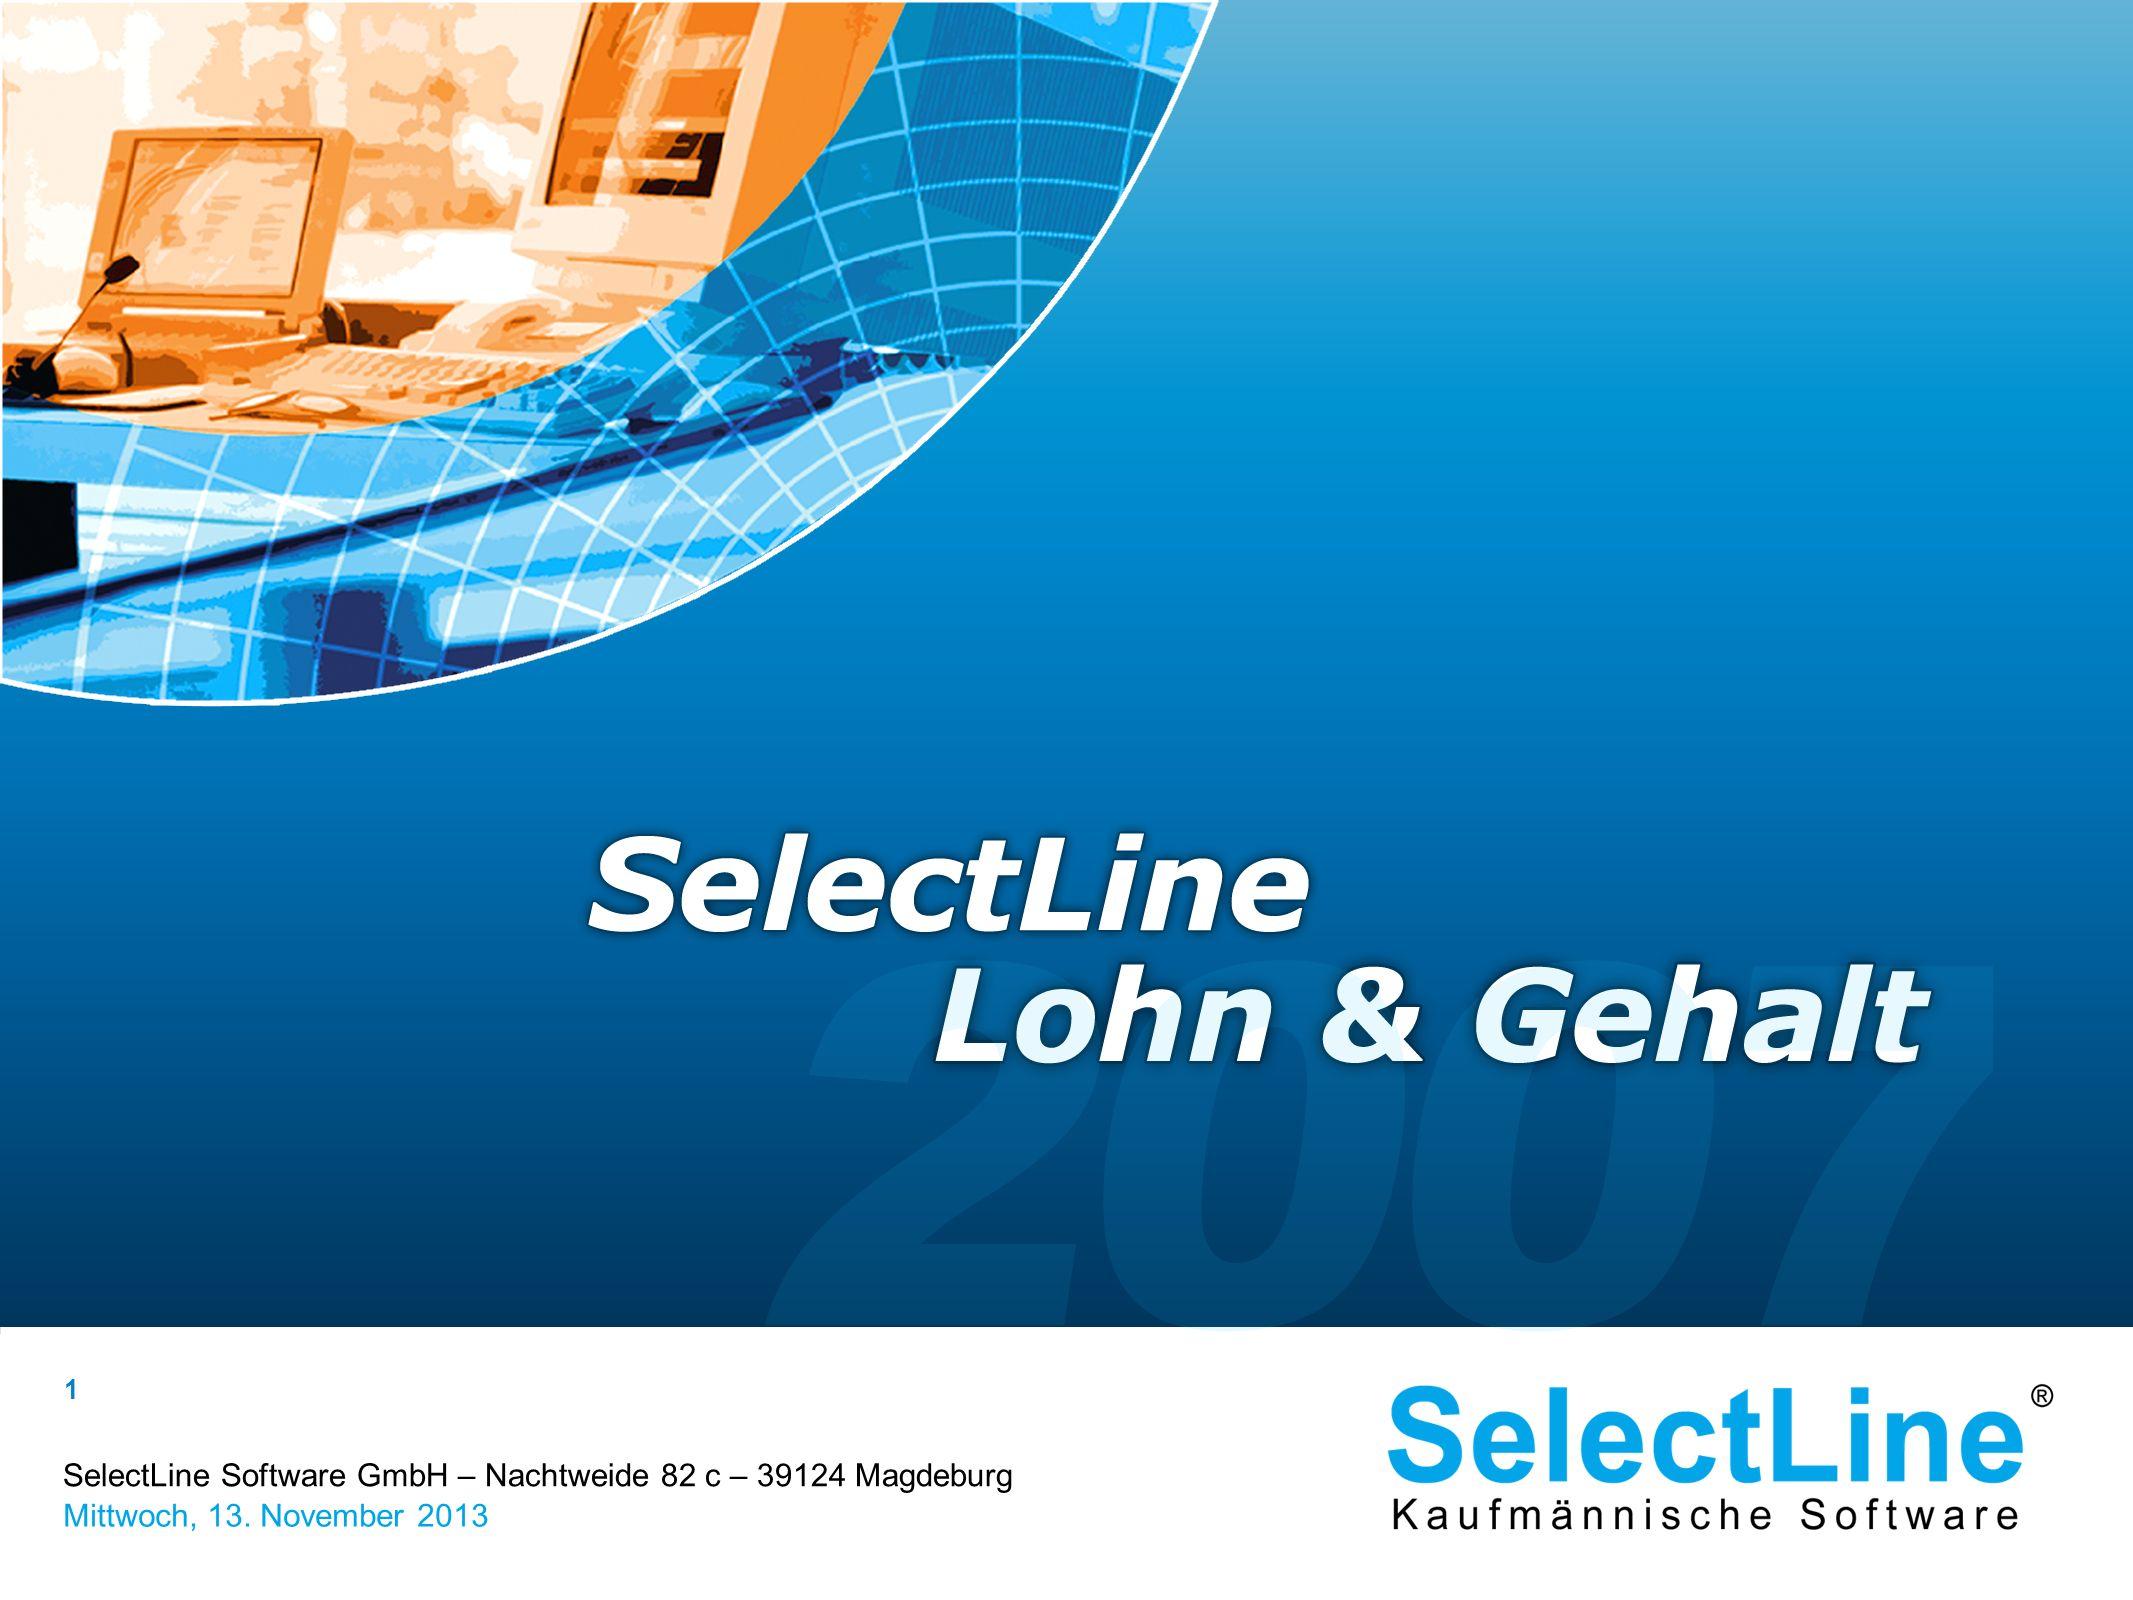 SelectLine Software GmbH – Nachtweide 82 c – 39124 Magdeburg Mittwoch, 13. November 2013 1